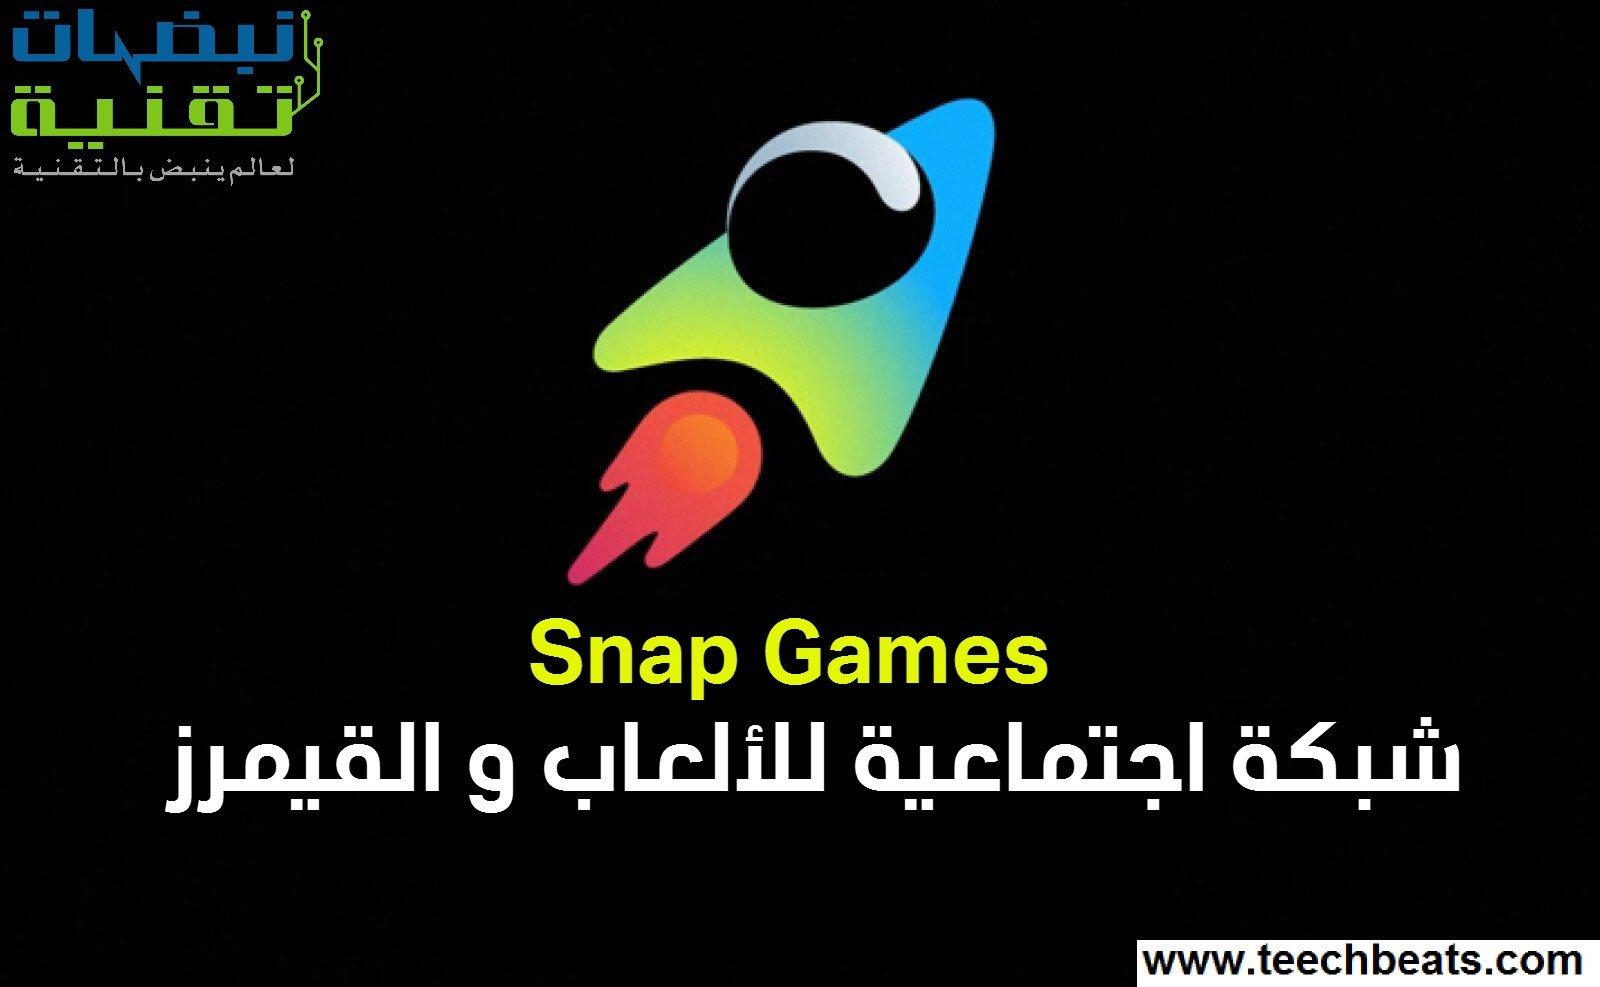 Snap Games شبكة اجتماعية للألعاب و القيمرز